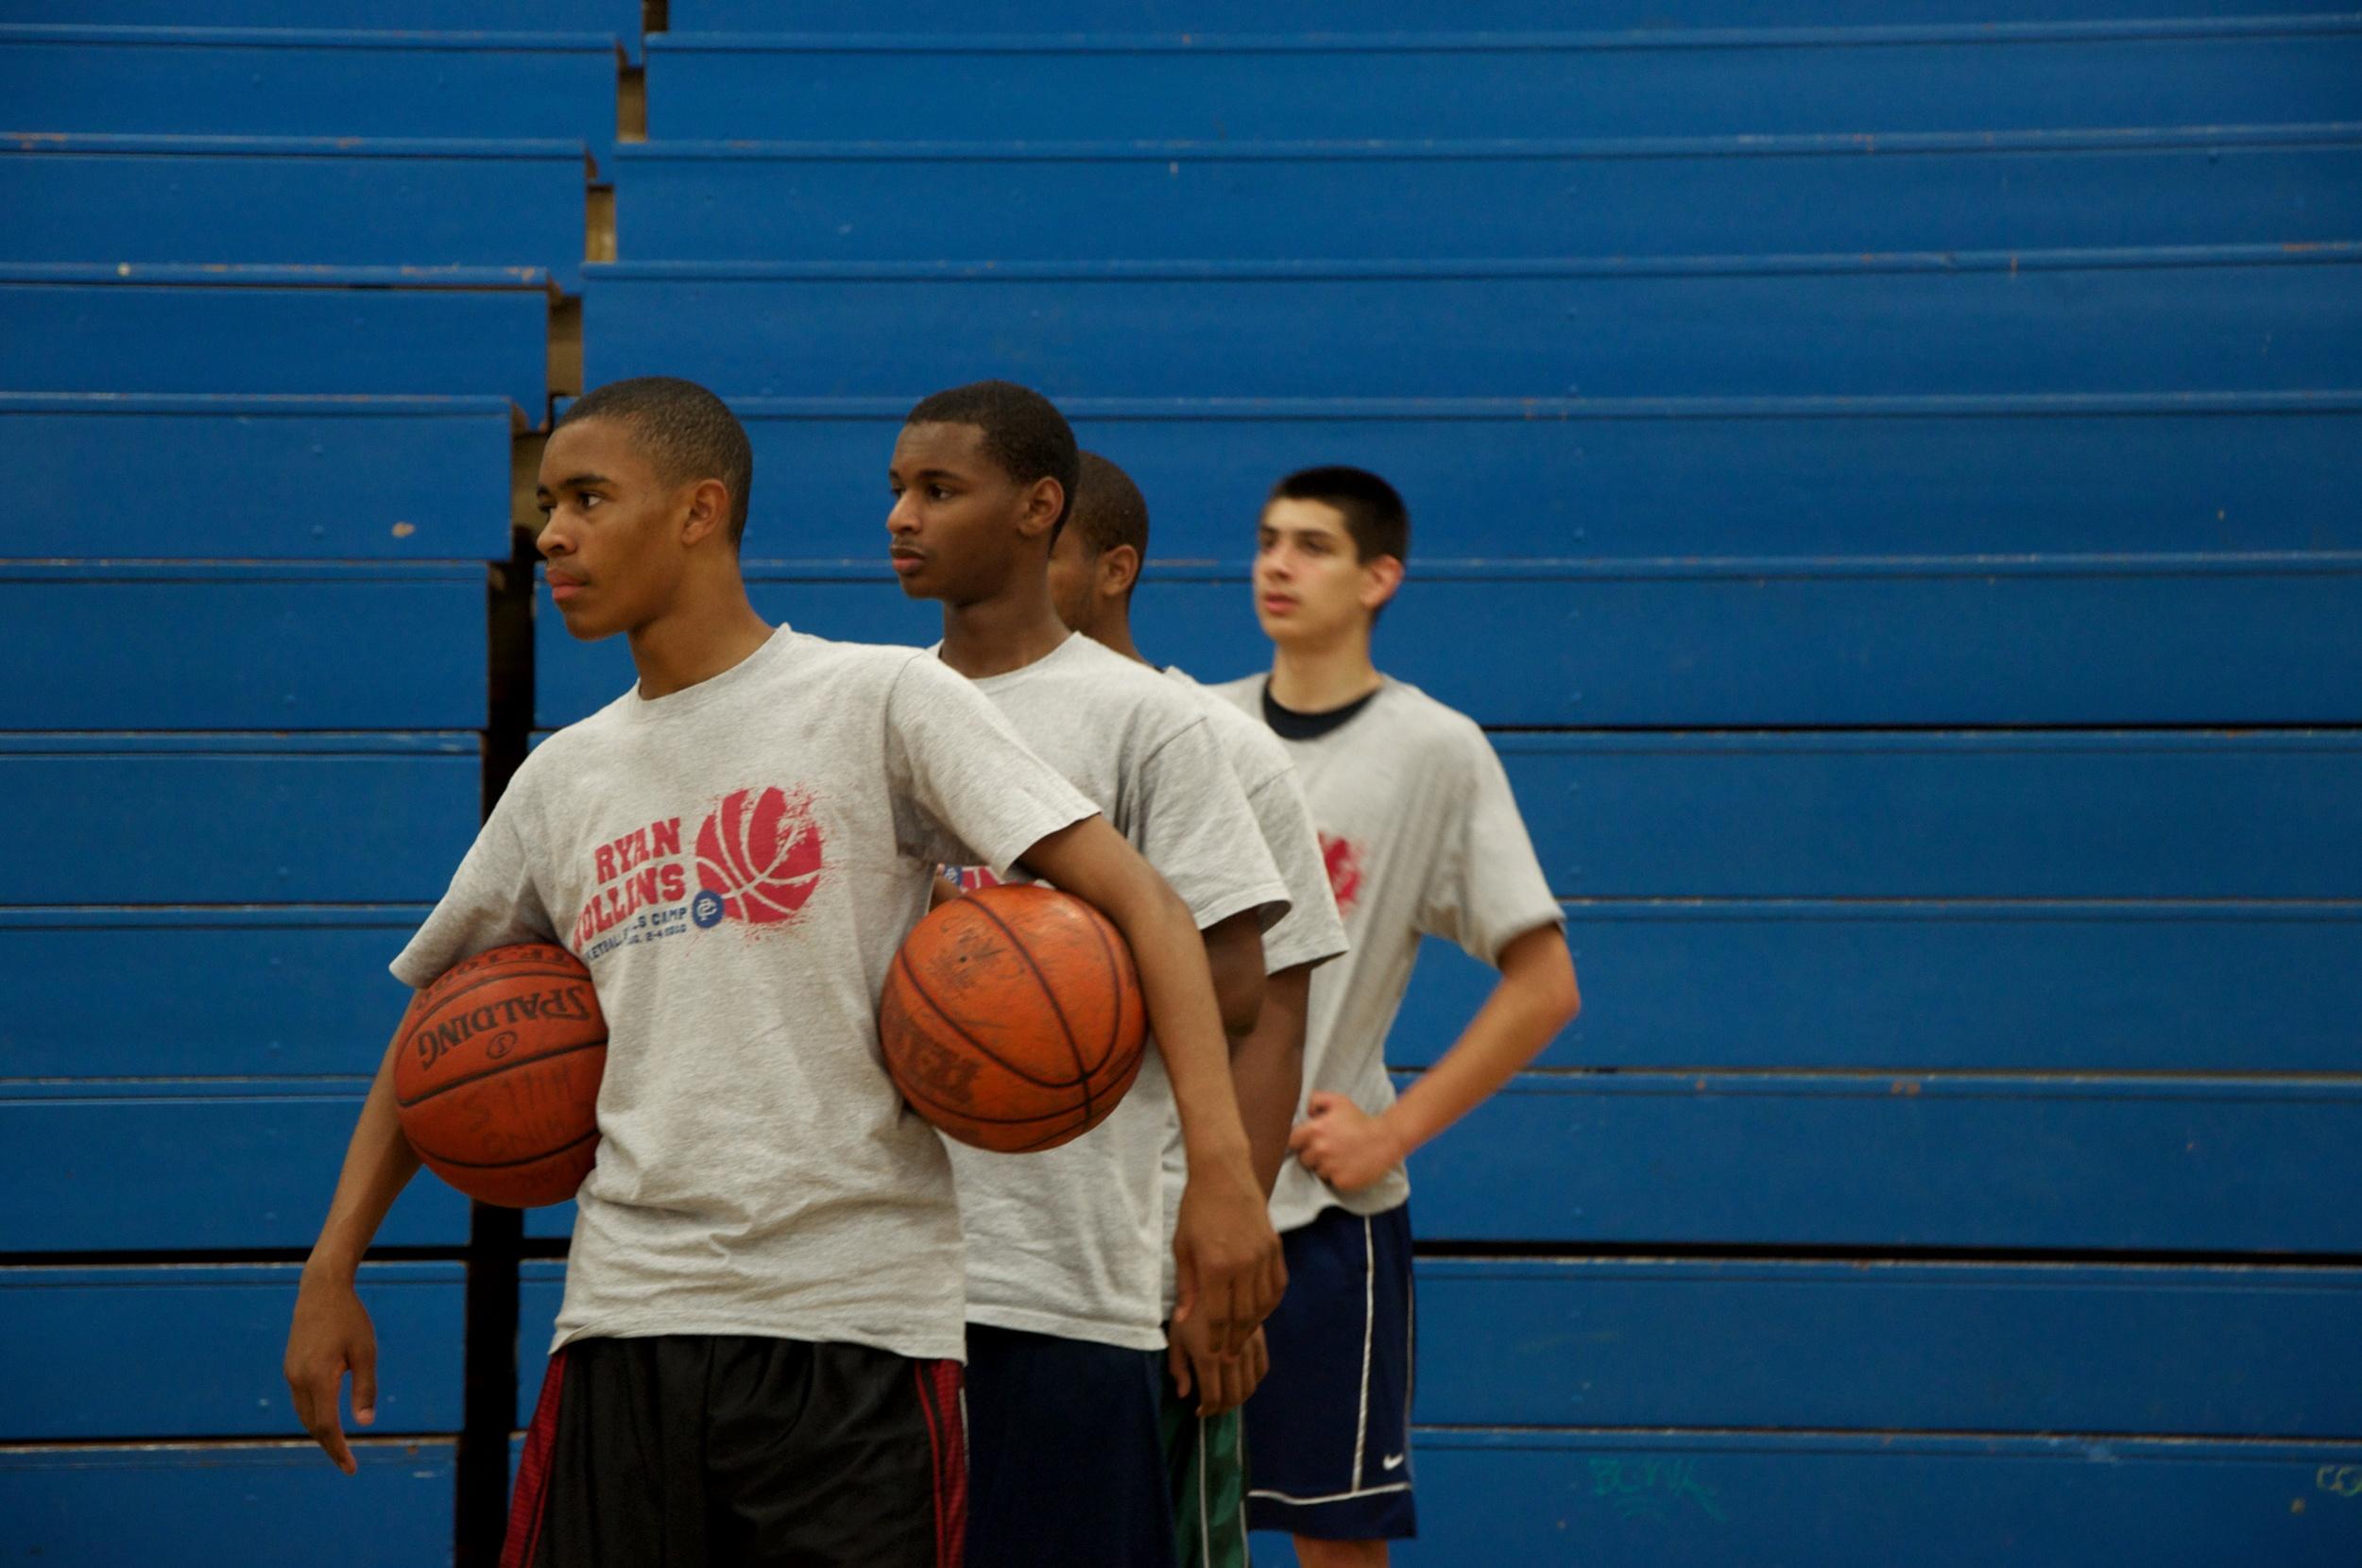 Ryan Hollins Basketball Camp 7.jpg